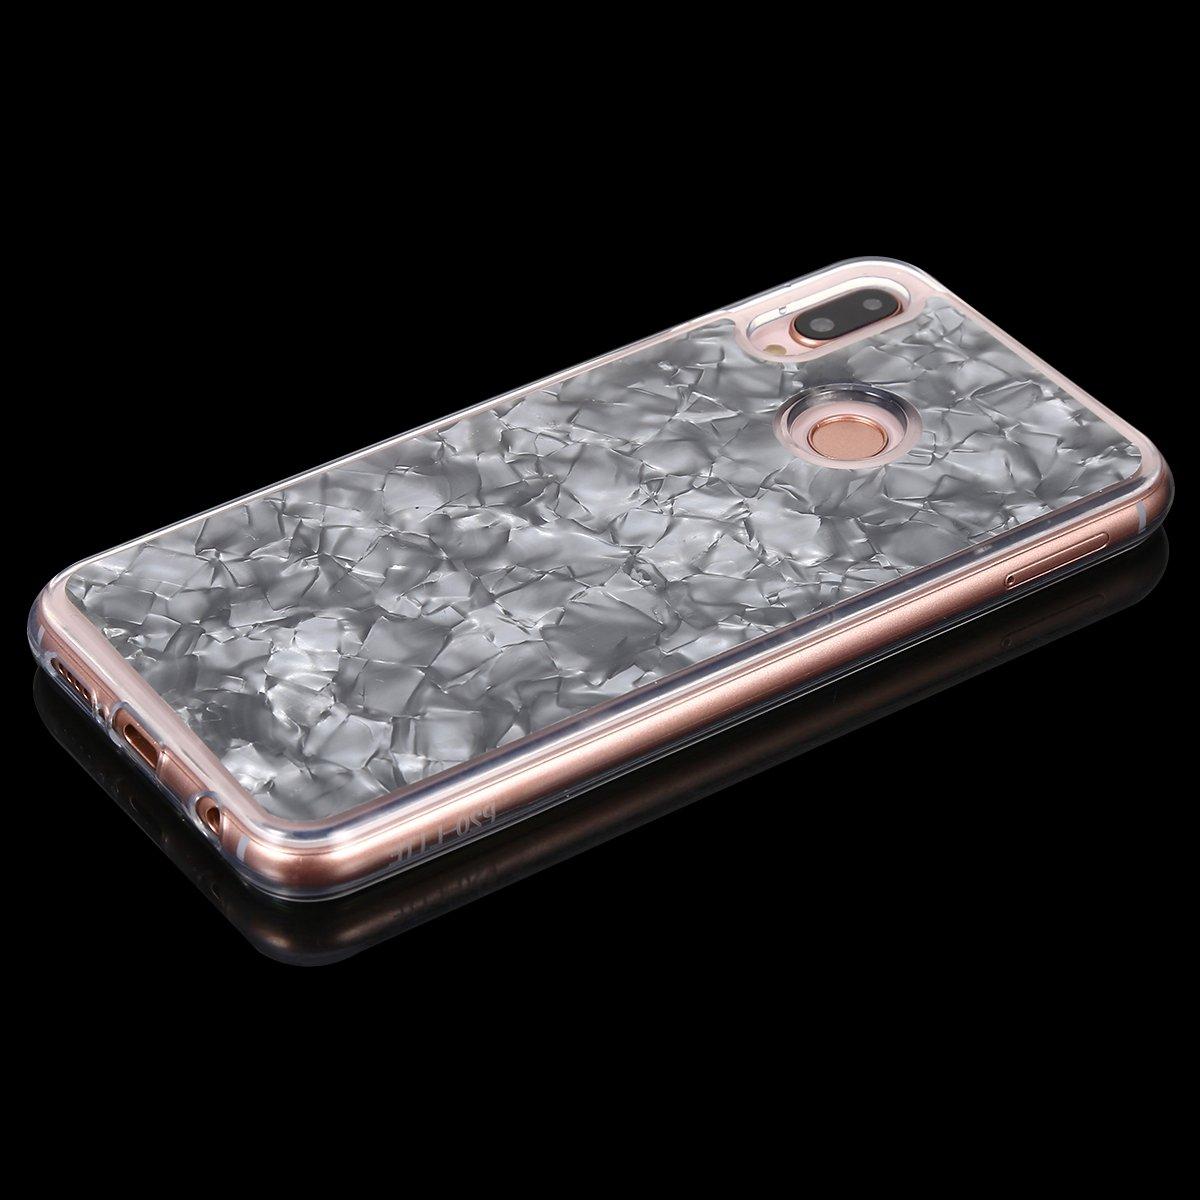 Surakey Funda Compatible para Huawei P20 Lite Funda Silicona Protecci/ón contra Ca/ídas Hybrid Protecci/ón Interna Flexible y Bordes de Parachoques duraderos,Rosado Anti-Ara/ñazos